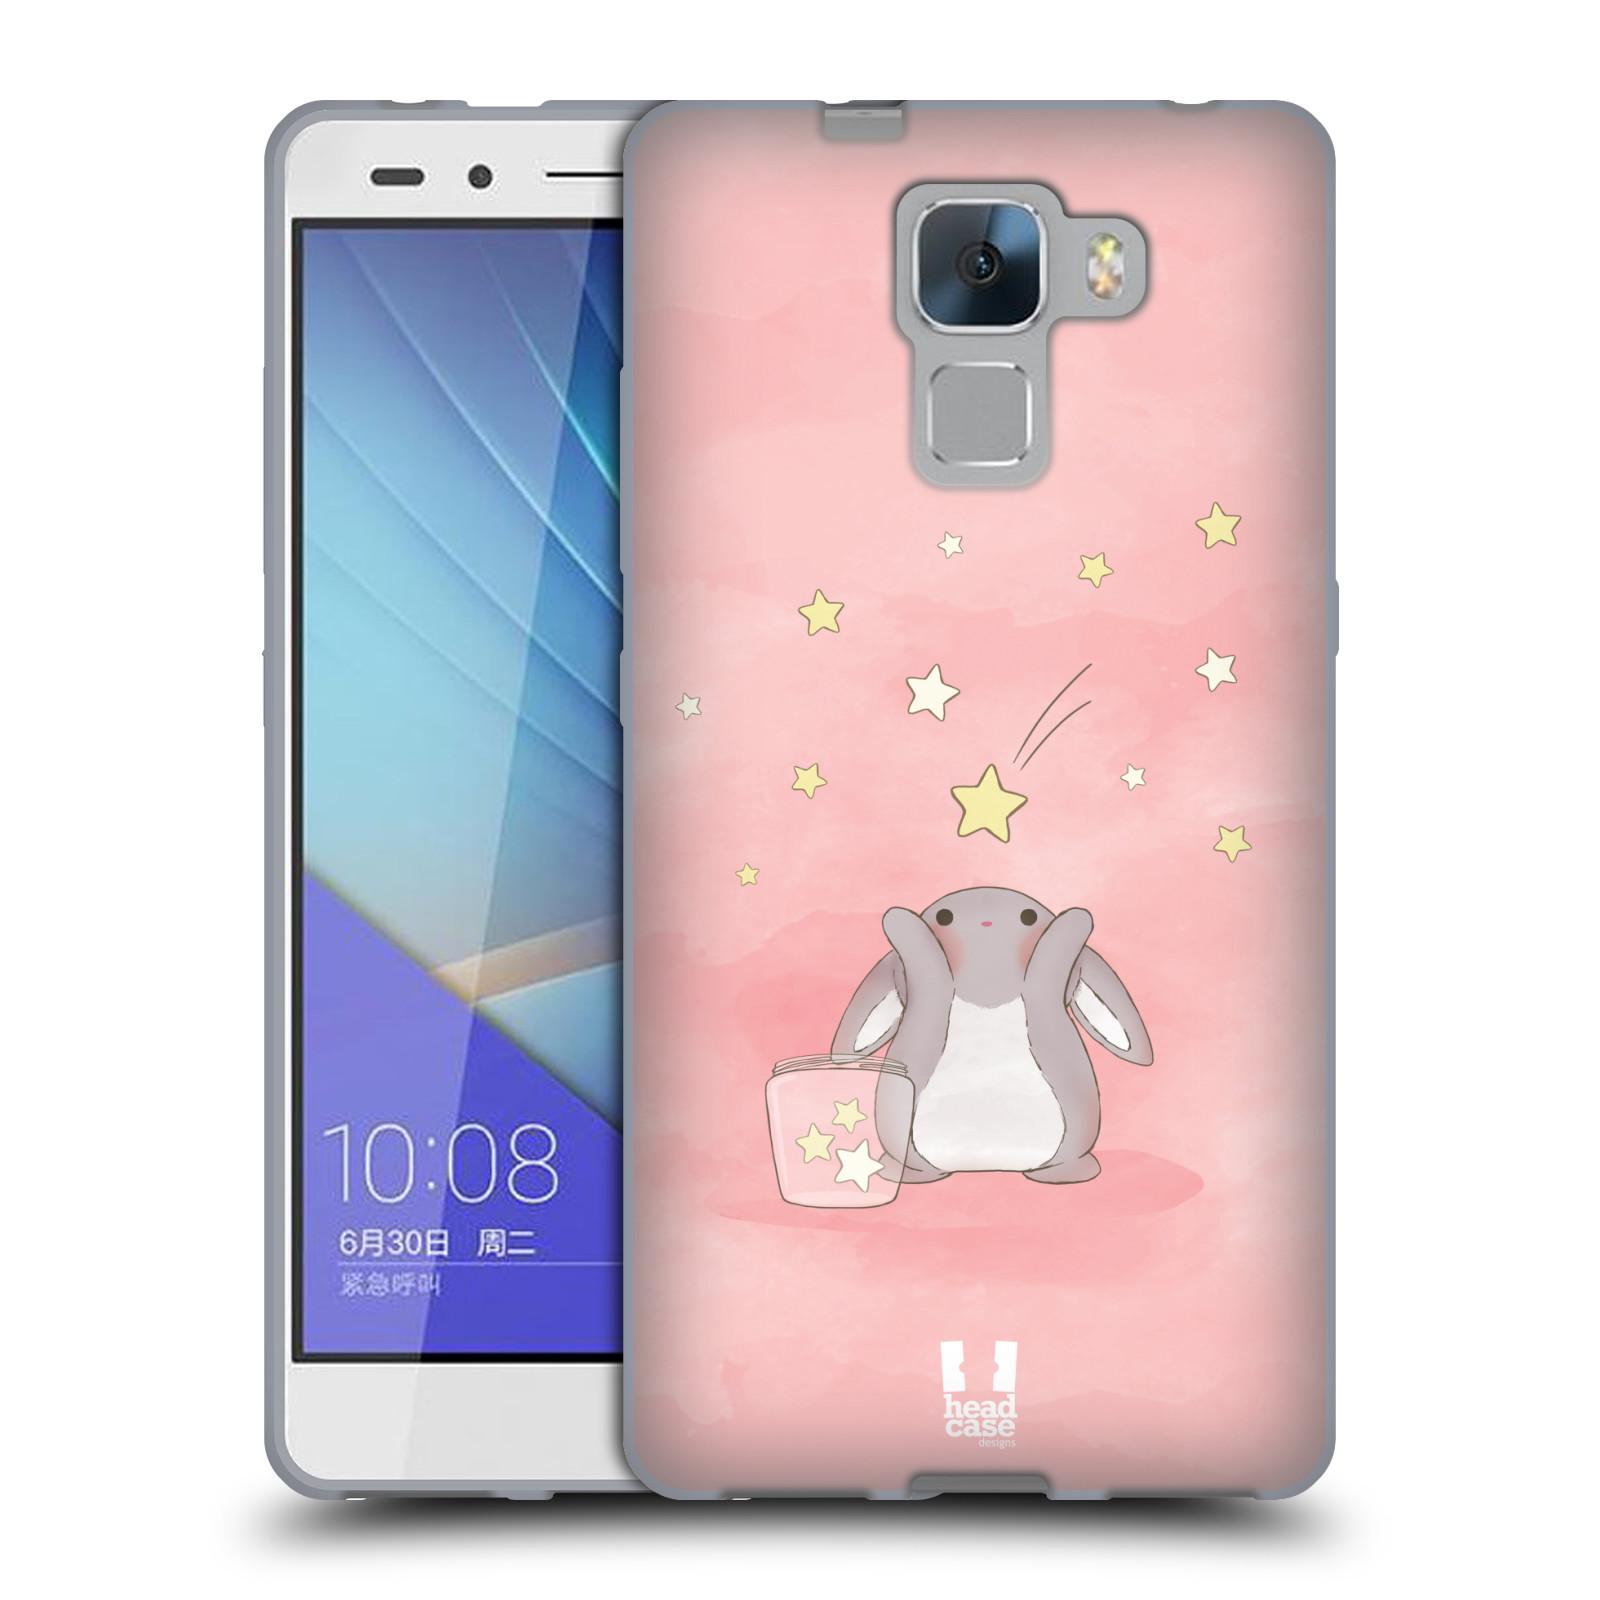 HEAD CASE silikonový obal na mobil HUAWEI HONOR 7 vzor králíček a hvězdy růžová